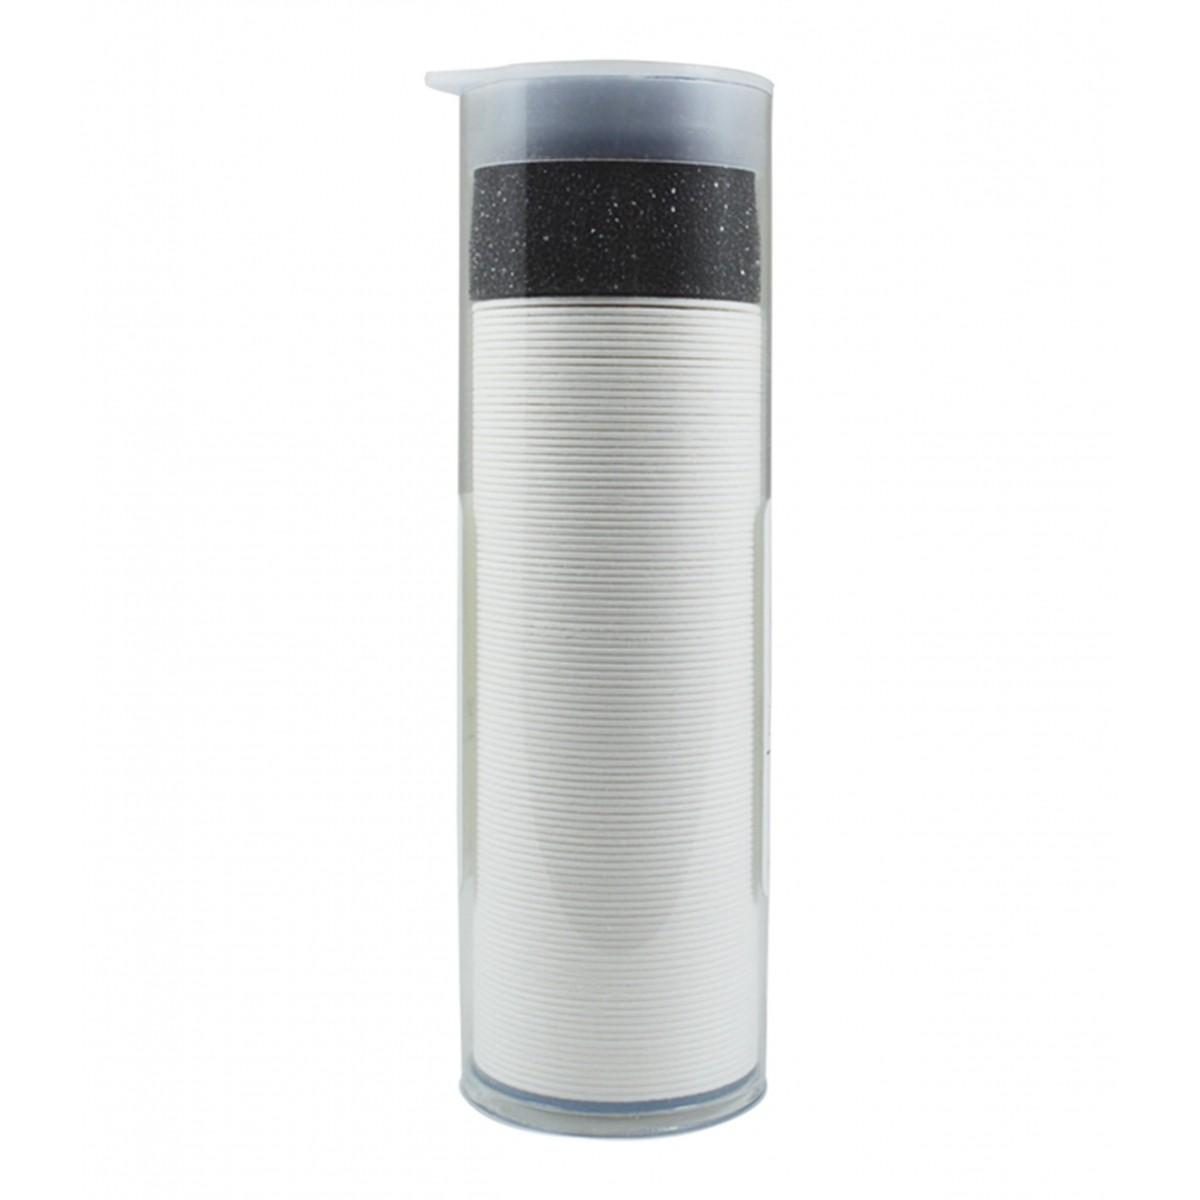 Filtro suporte PAD 37mm - FSP-37